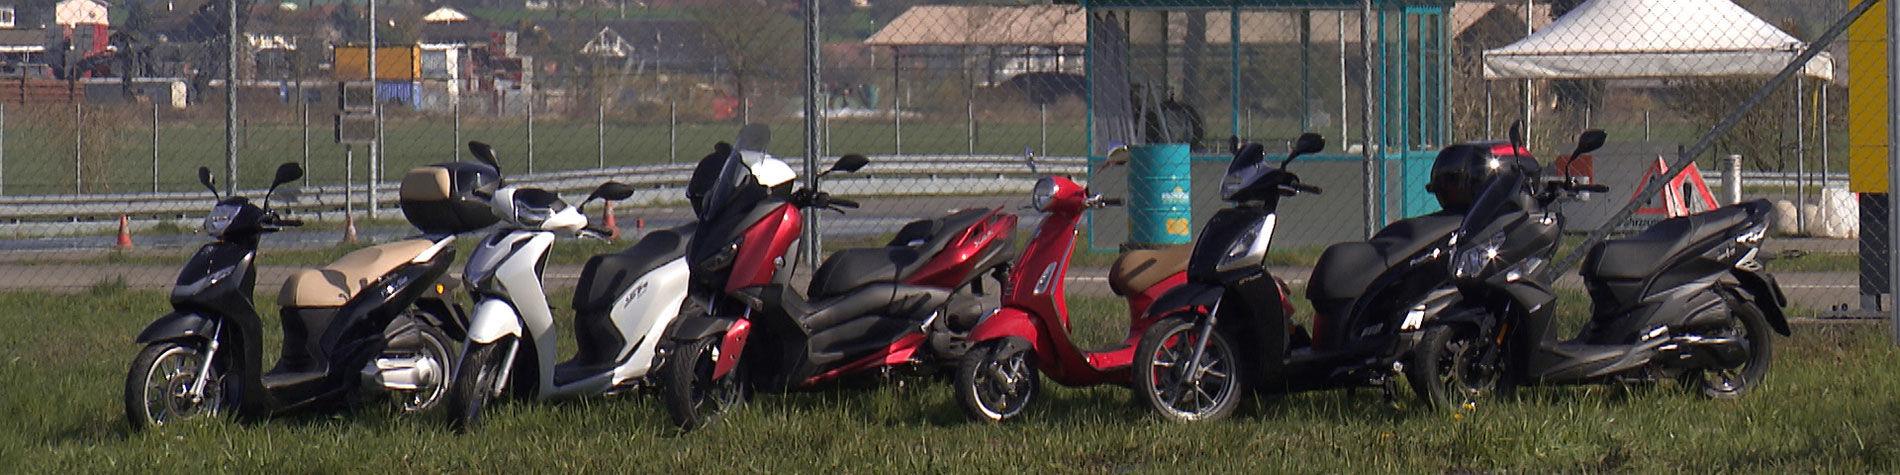 Test Scooter 125 Ccm 2018 Tcs Suisse